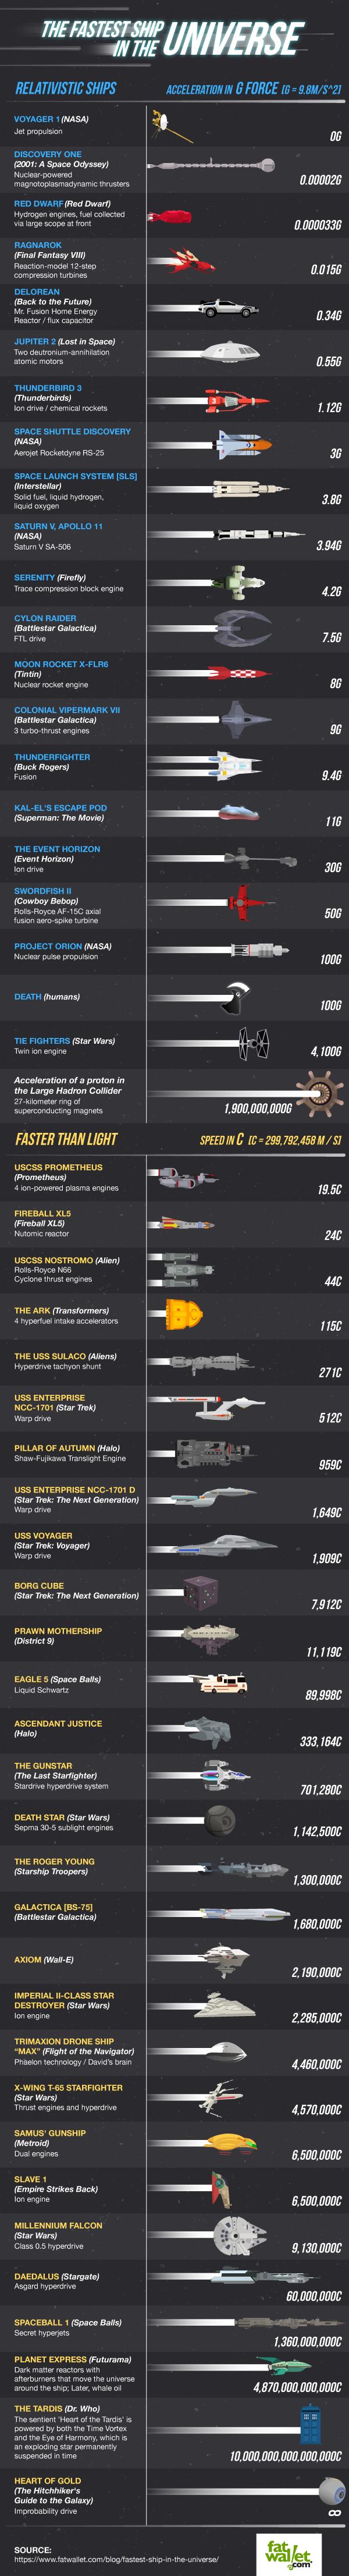 fastest-ship-sci-fi-history-infografik